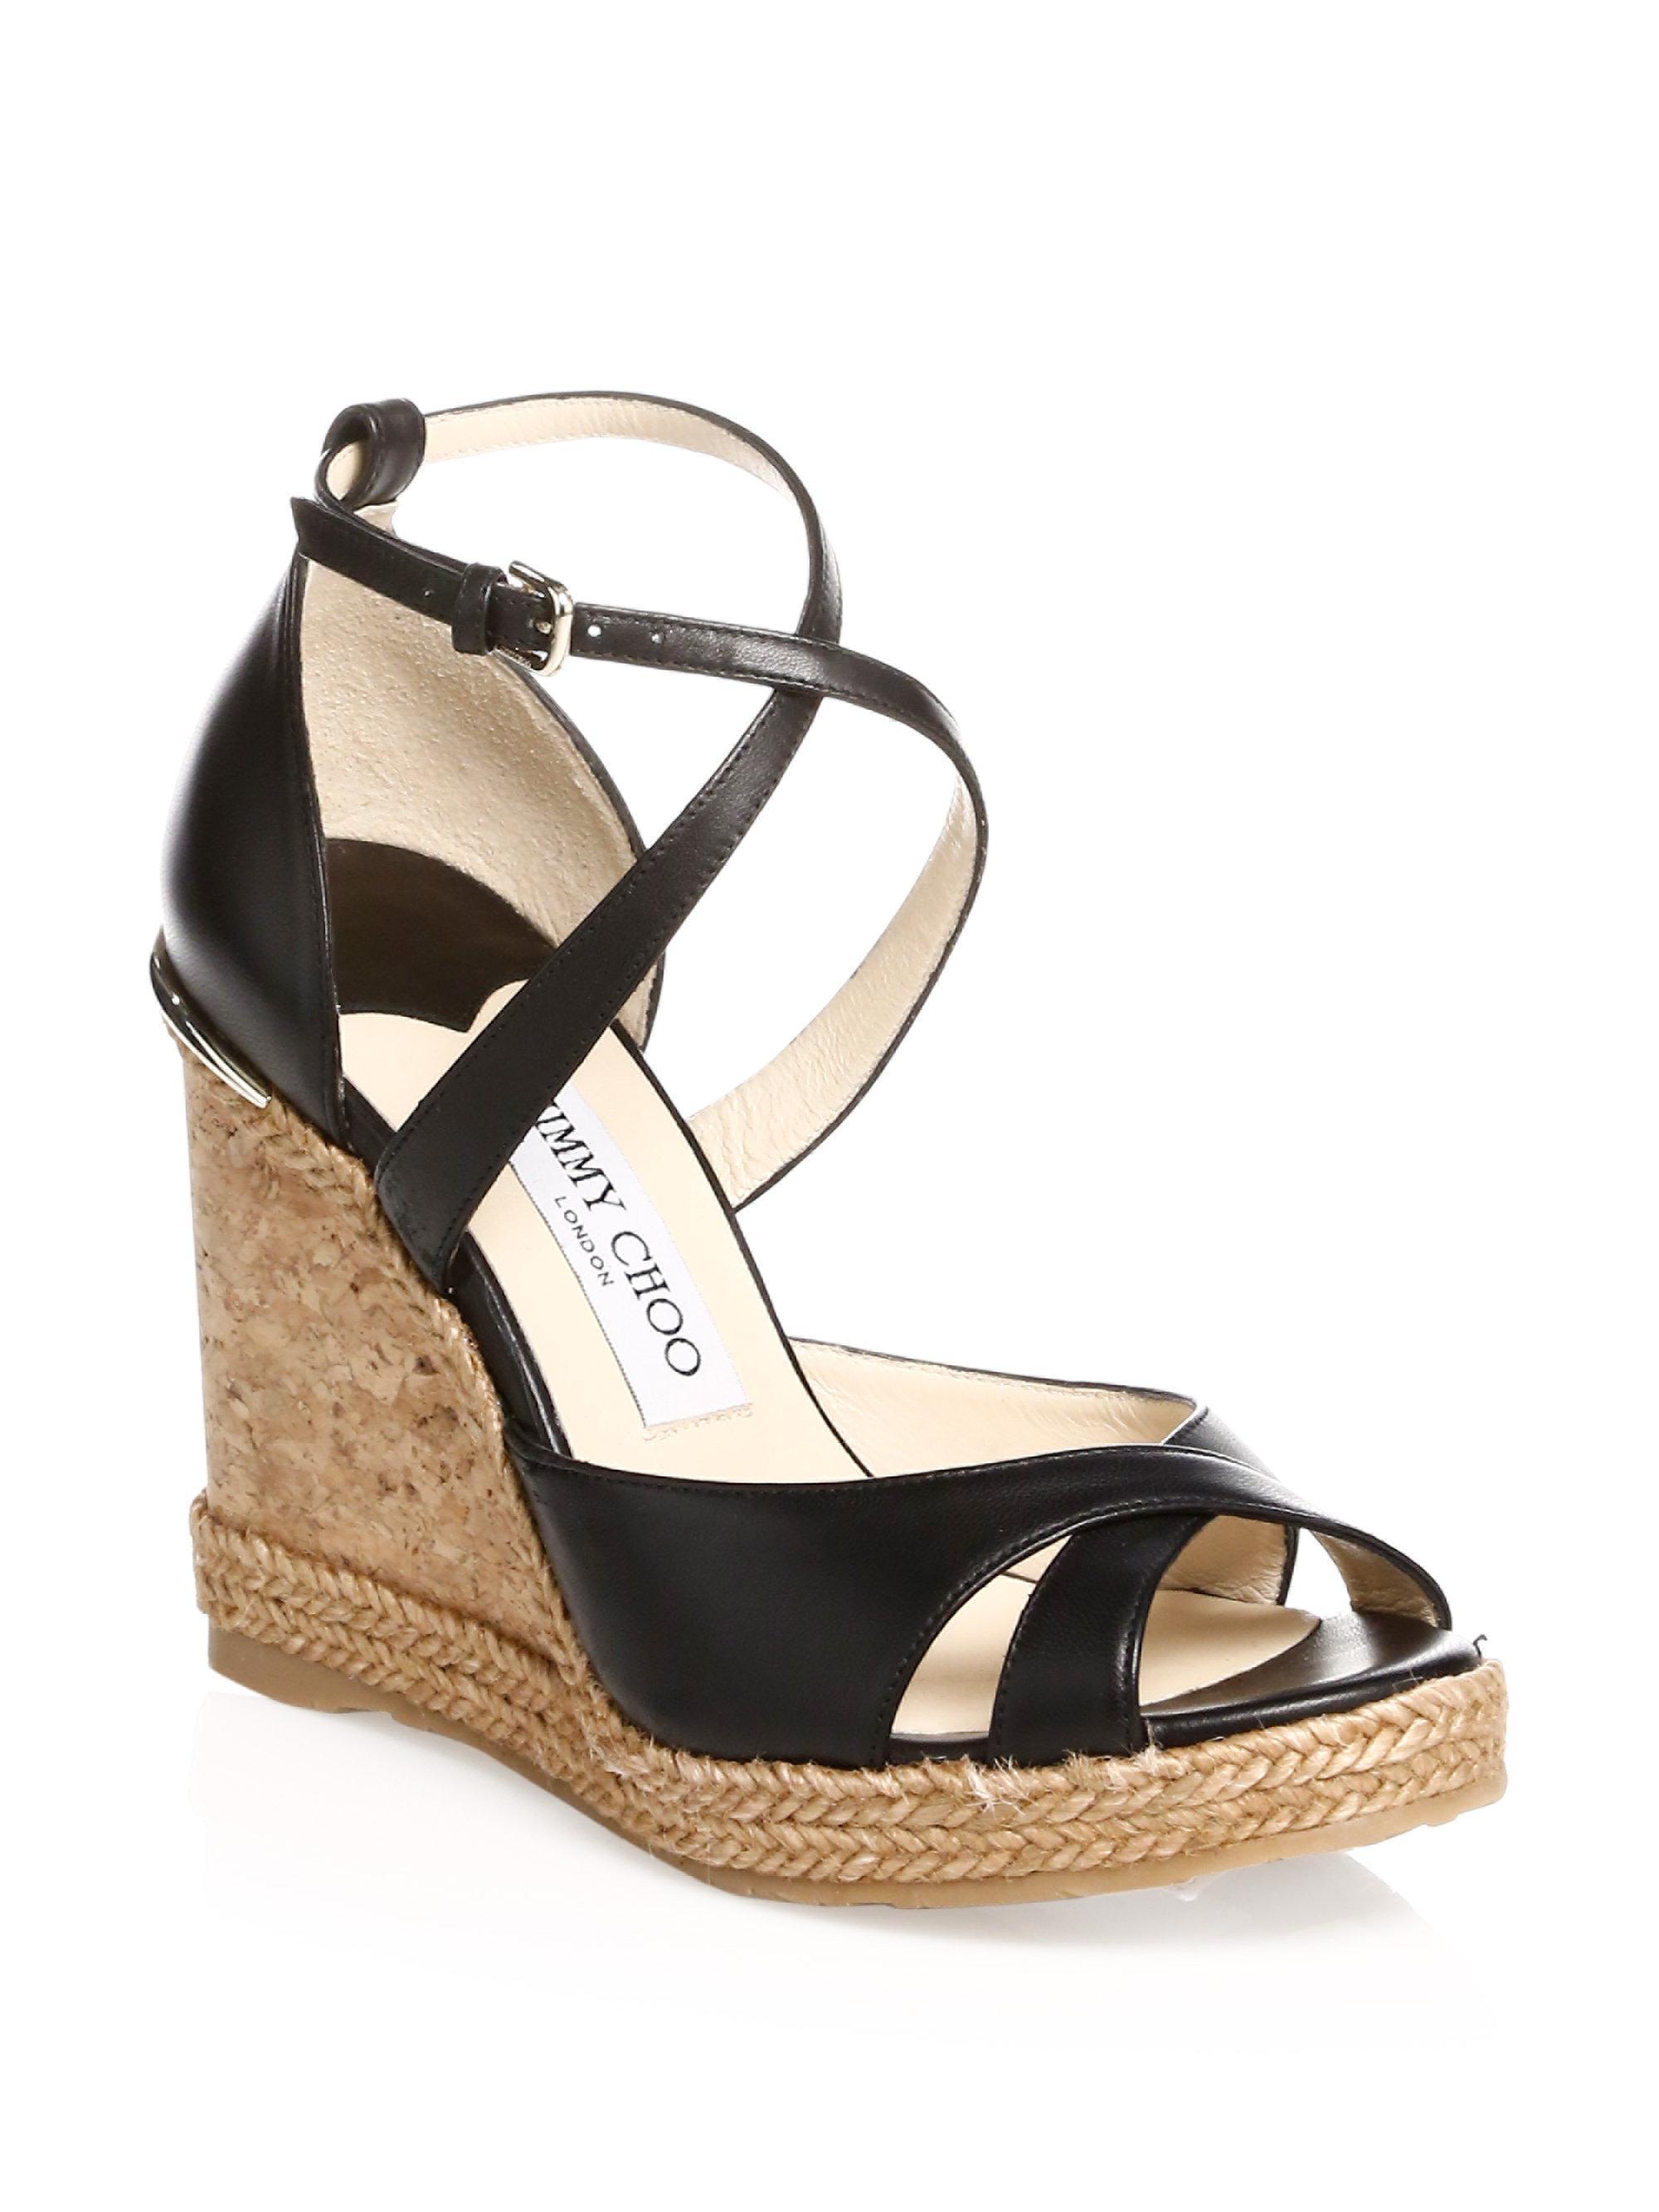 Alanah 80 leather wedge sandals Jimmy Choo London Clearance Discount DuRUd8